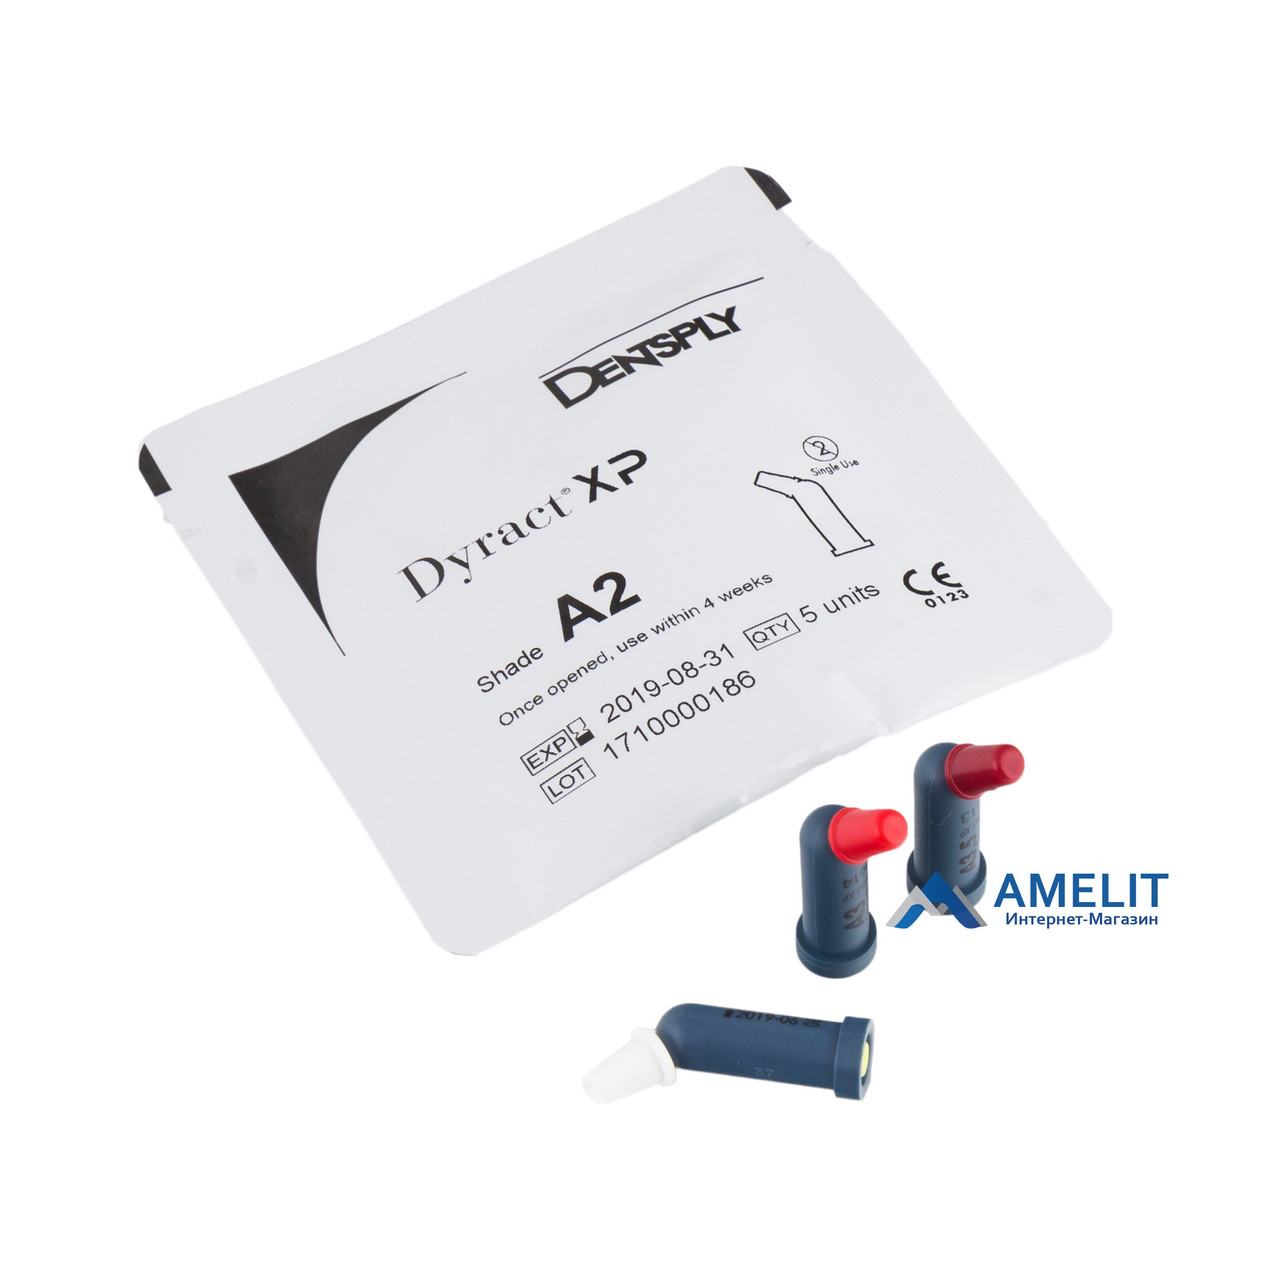 Дайрект XP A2 (Dyract® XP, Dentsply Sirona), канюля 0,24г